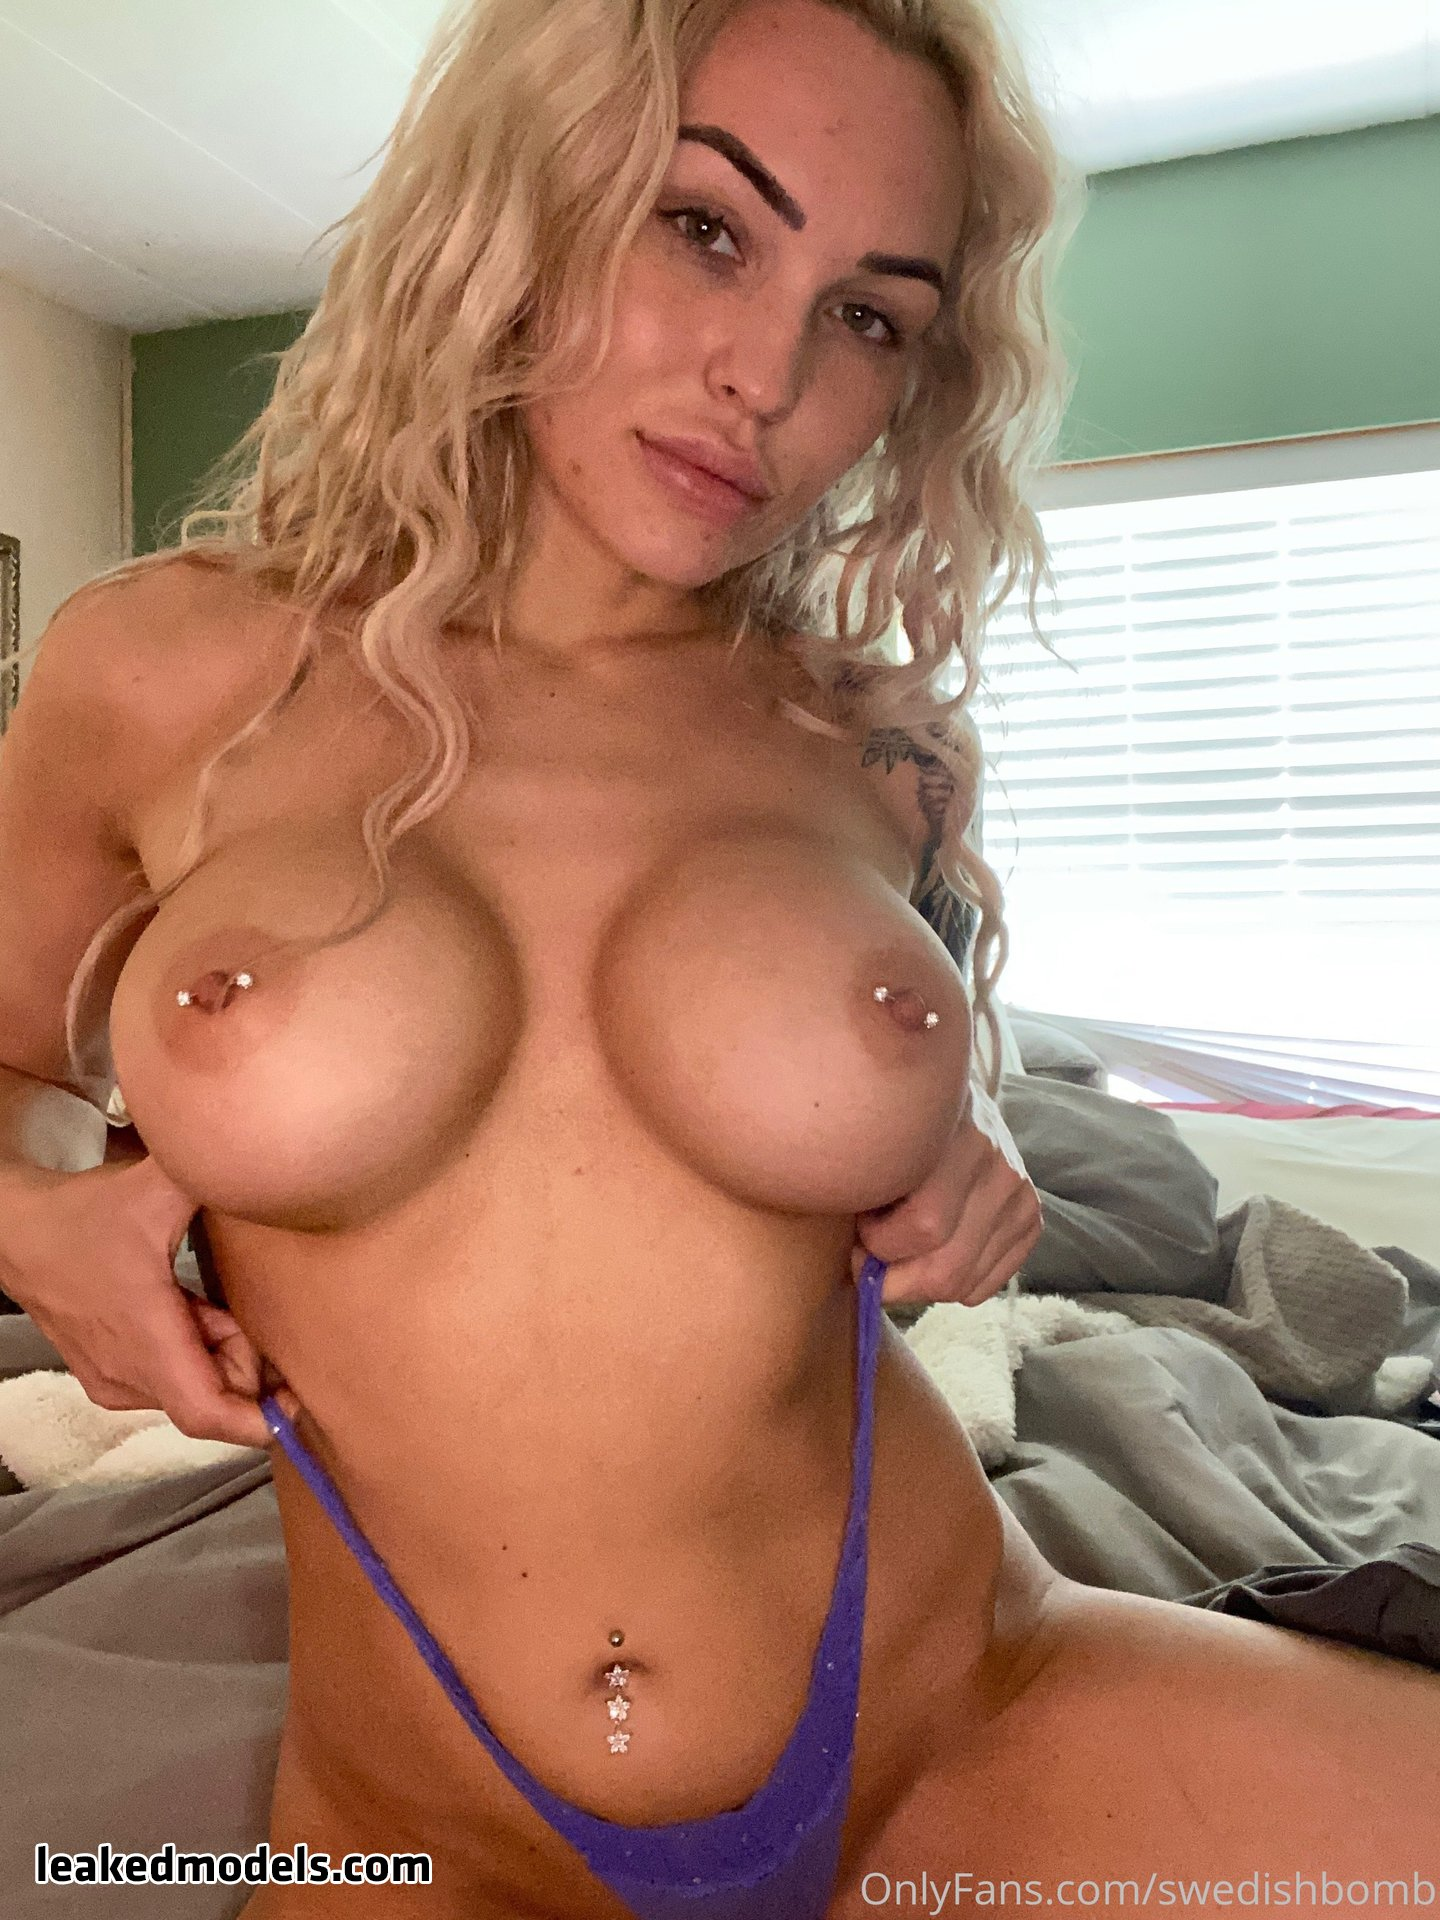 Barista Kailyn – swedishbomb OnlyFans Nude Leaks (30 Photos)